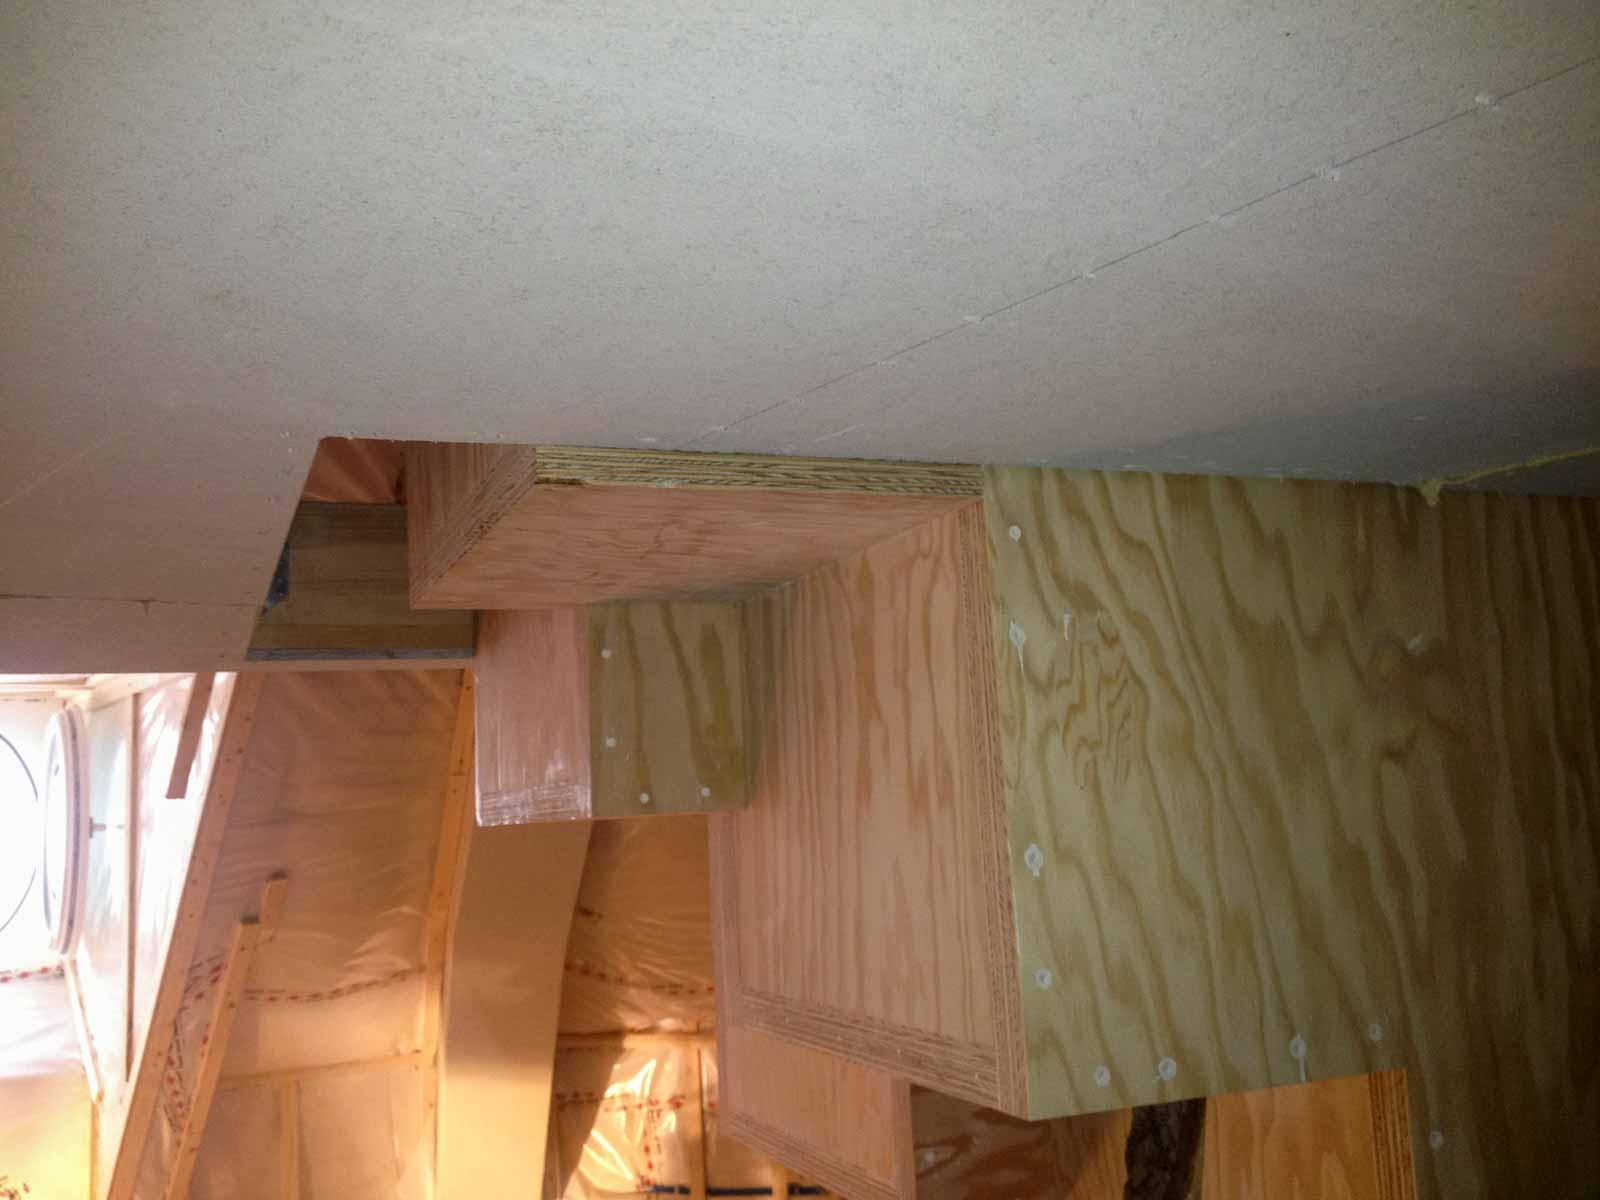 Wooddesign_Holzdesign_Treppe_Holztreppe_schwebend_2-teilig_atelierducret_freiburg(9)